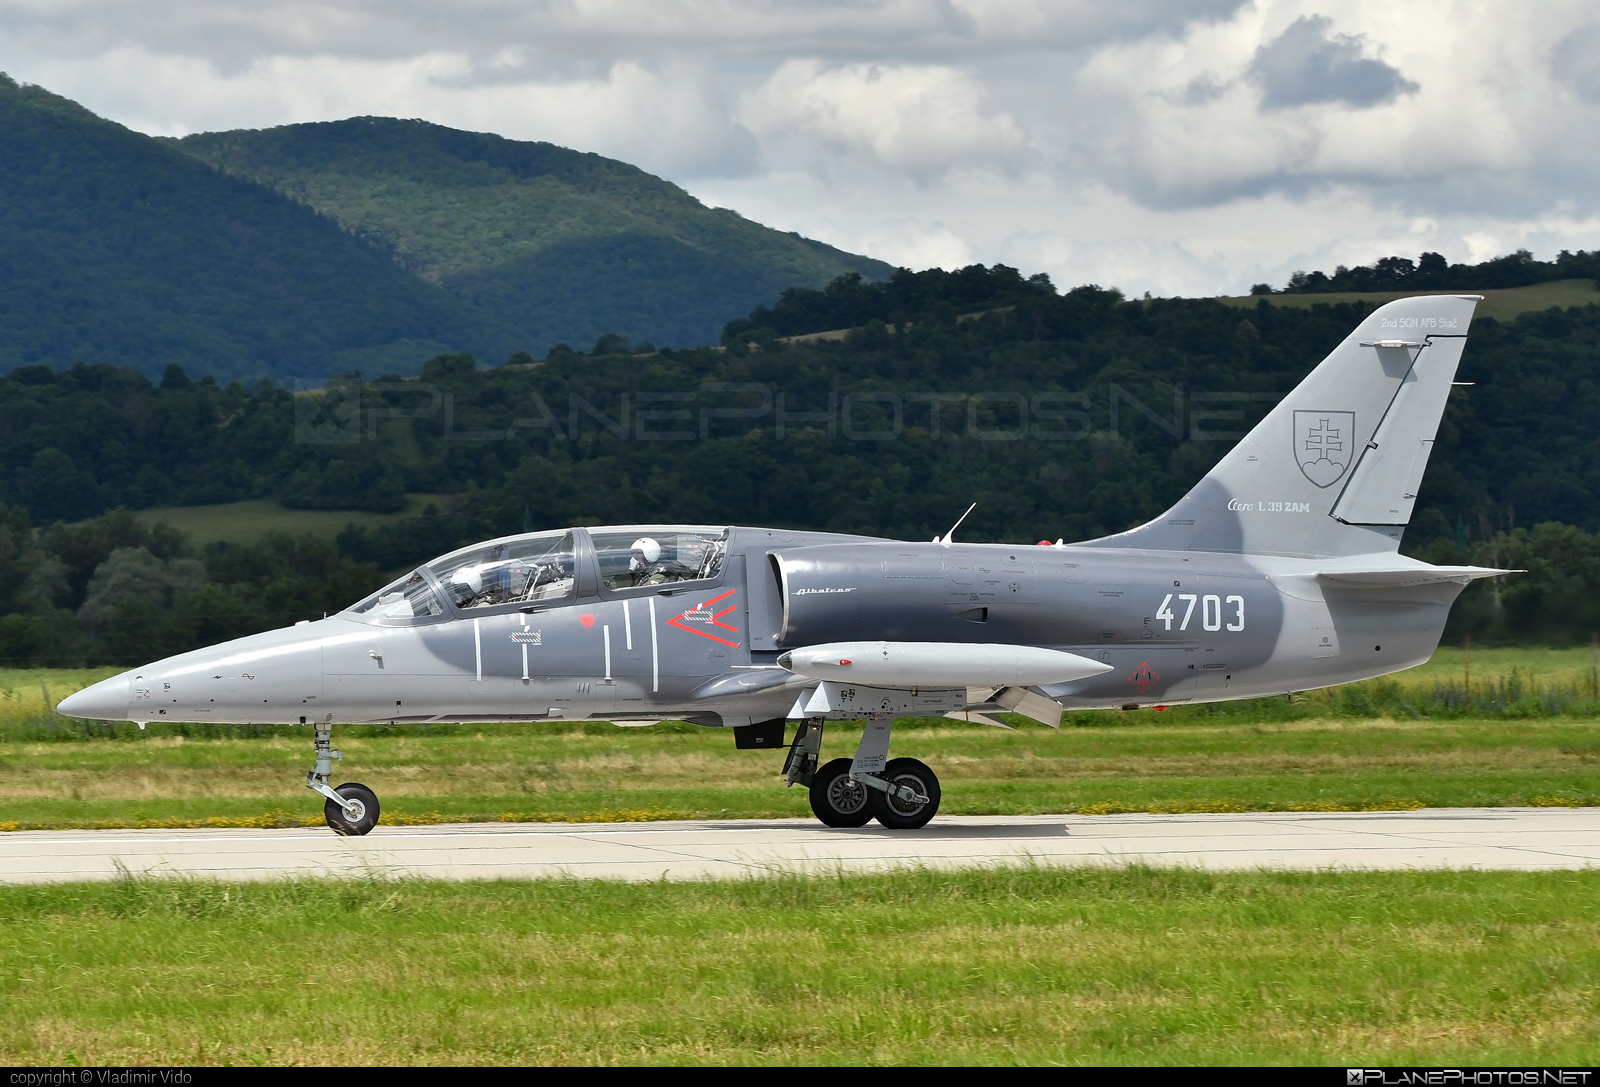 Aero L-39ZAM Albatros - 4703 operated by Vzdušné sily OS SR (Slovak Air Force) #aero #aerol39 #aerol39albatros #aerol39zamalbatros #albatros #l39 #l39zam #l39zamalbatros #slovakairforce #vzdusnesilyossr